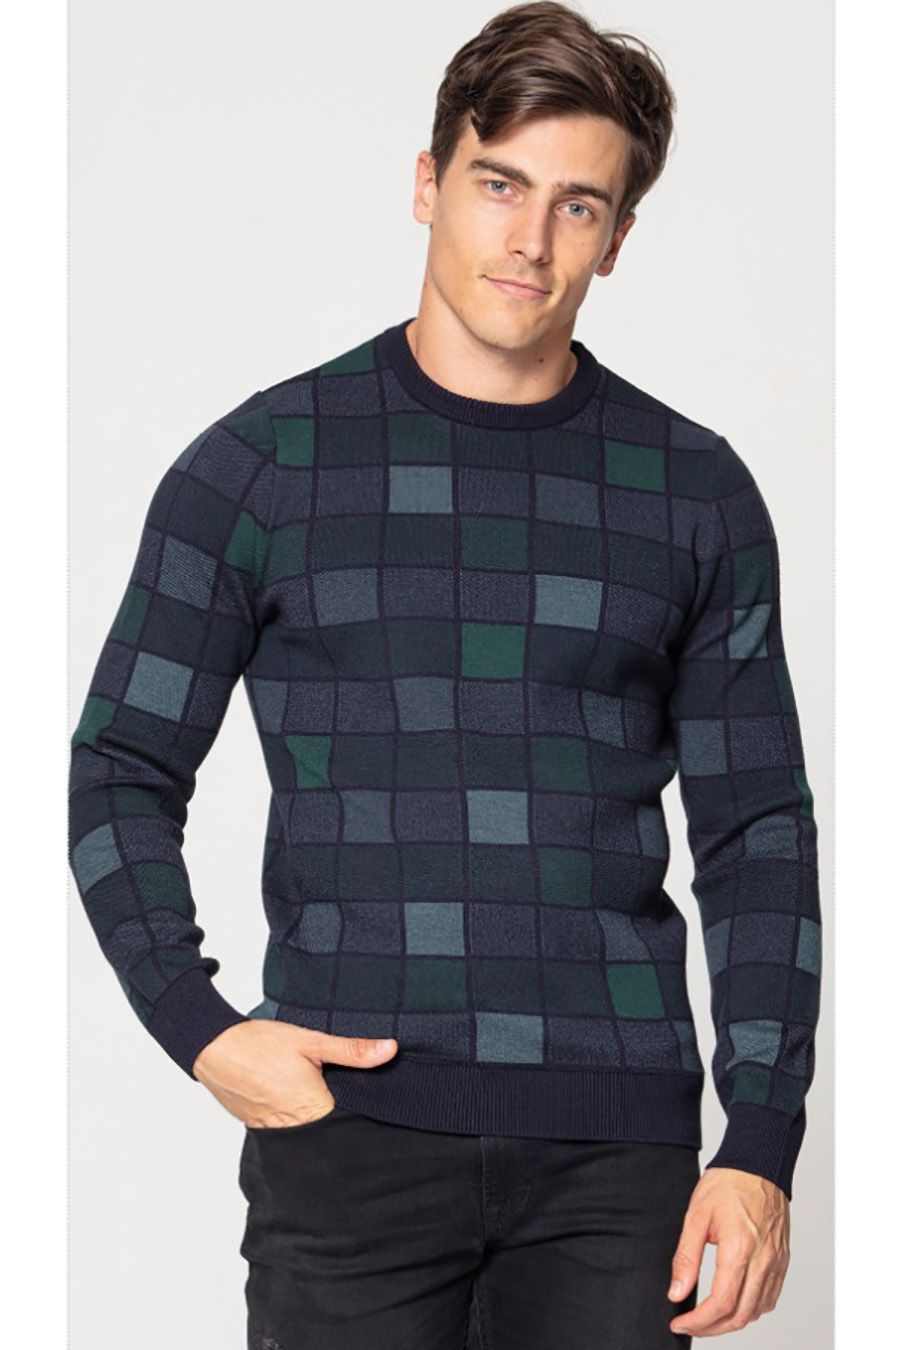 Джемпер (свитер) мужской Pooll Park 201402 Laci (Green) - фото 1